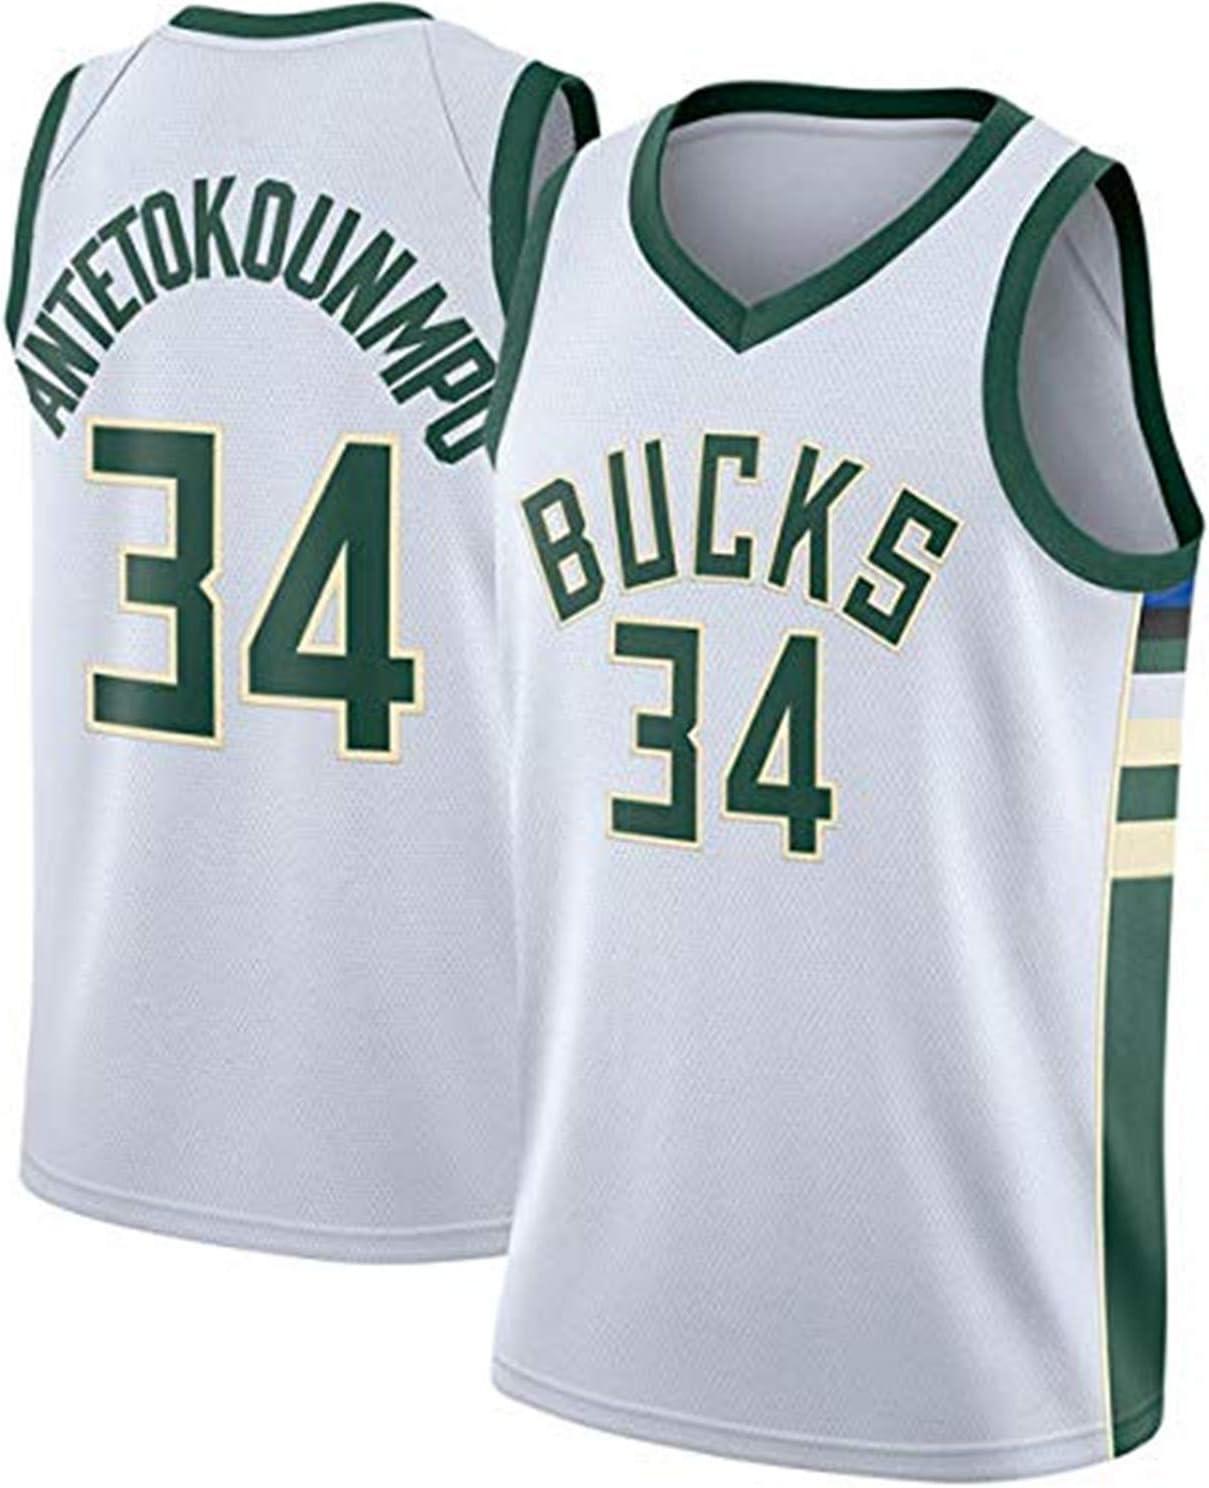 Milwaukee Bucks #34 Giannis Antetokounmpo Bordado NBA Transpirable y Resistente al Desgaste Camiseta para Fan Rying Camiseta de Baloncesto para Hombre